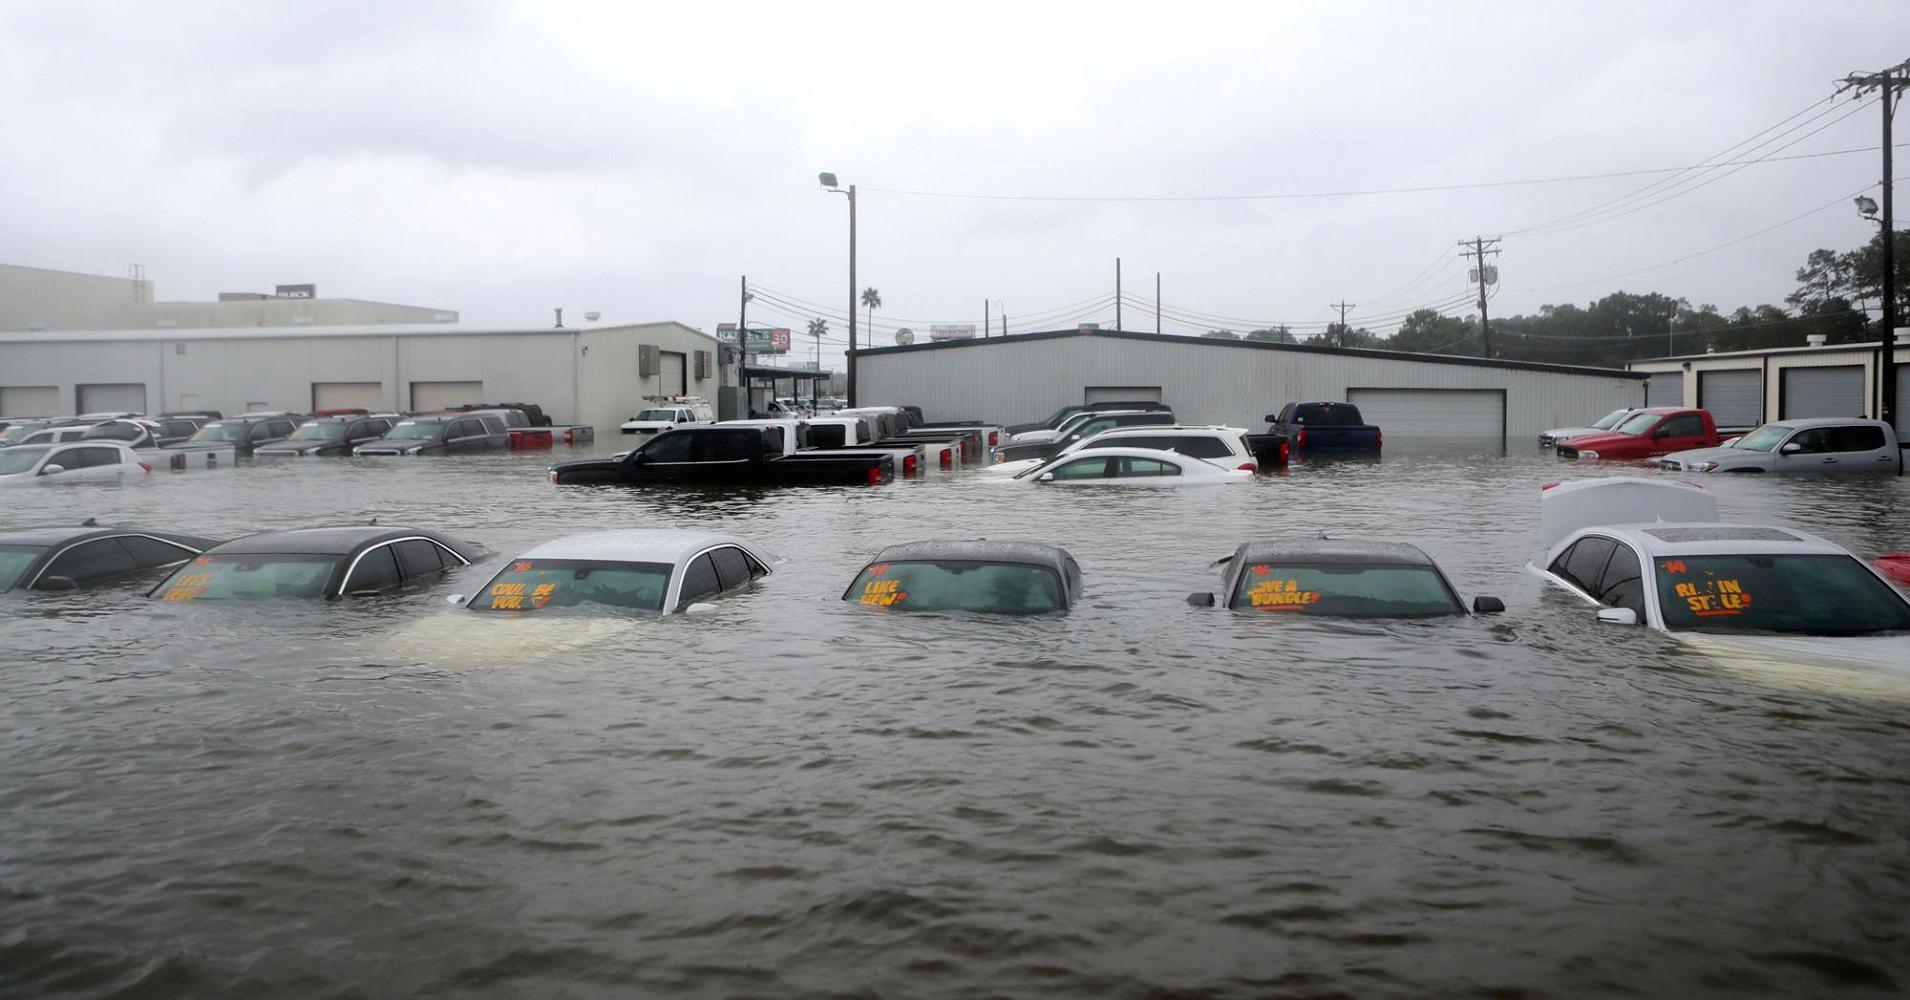 Used Car Dealerships In Dickinson Texas